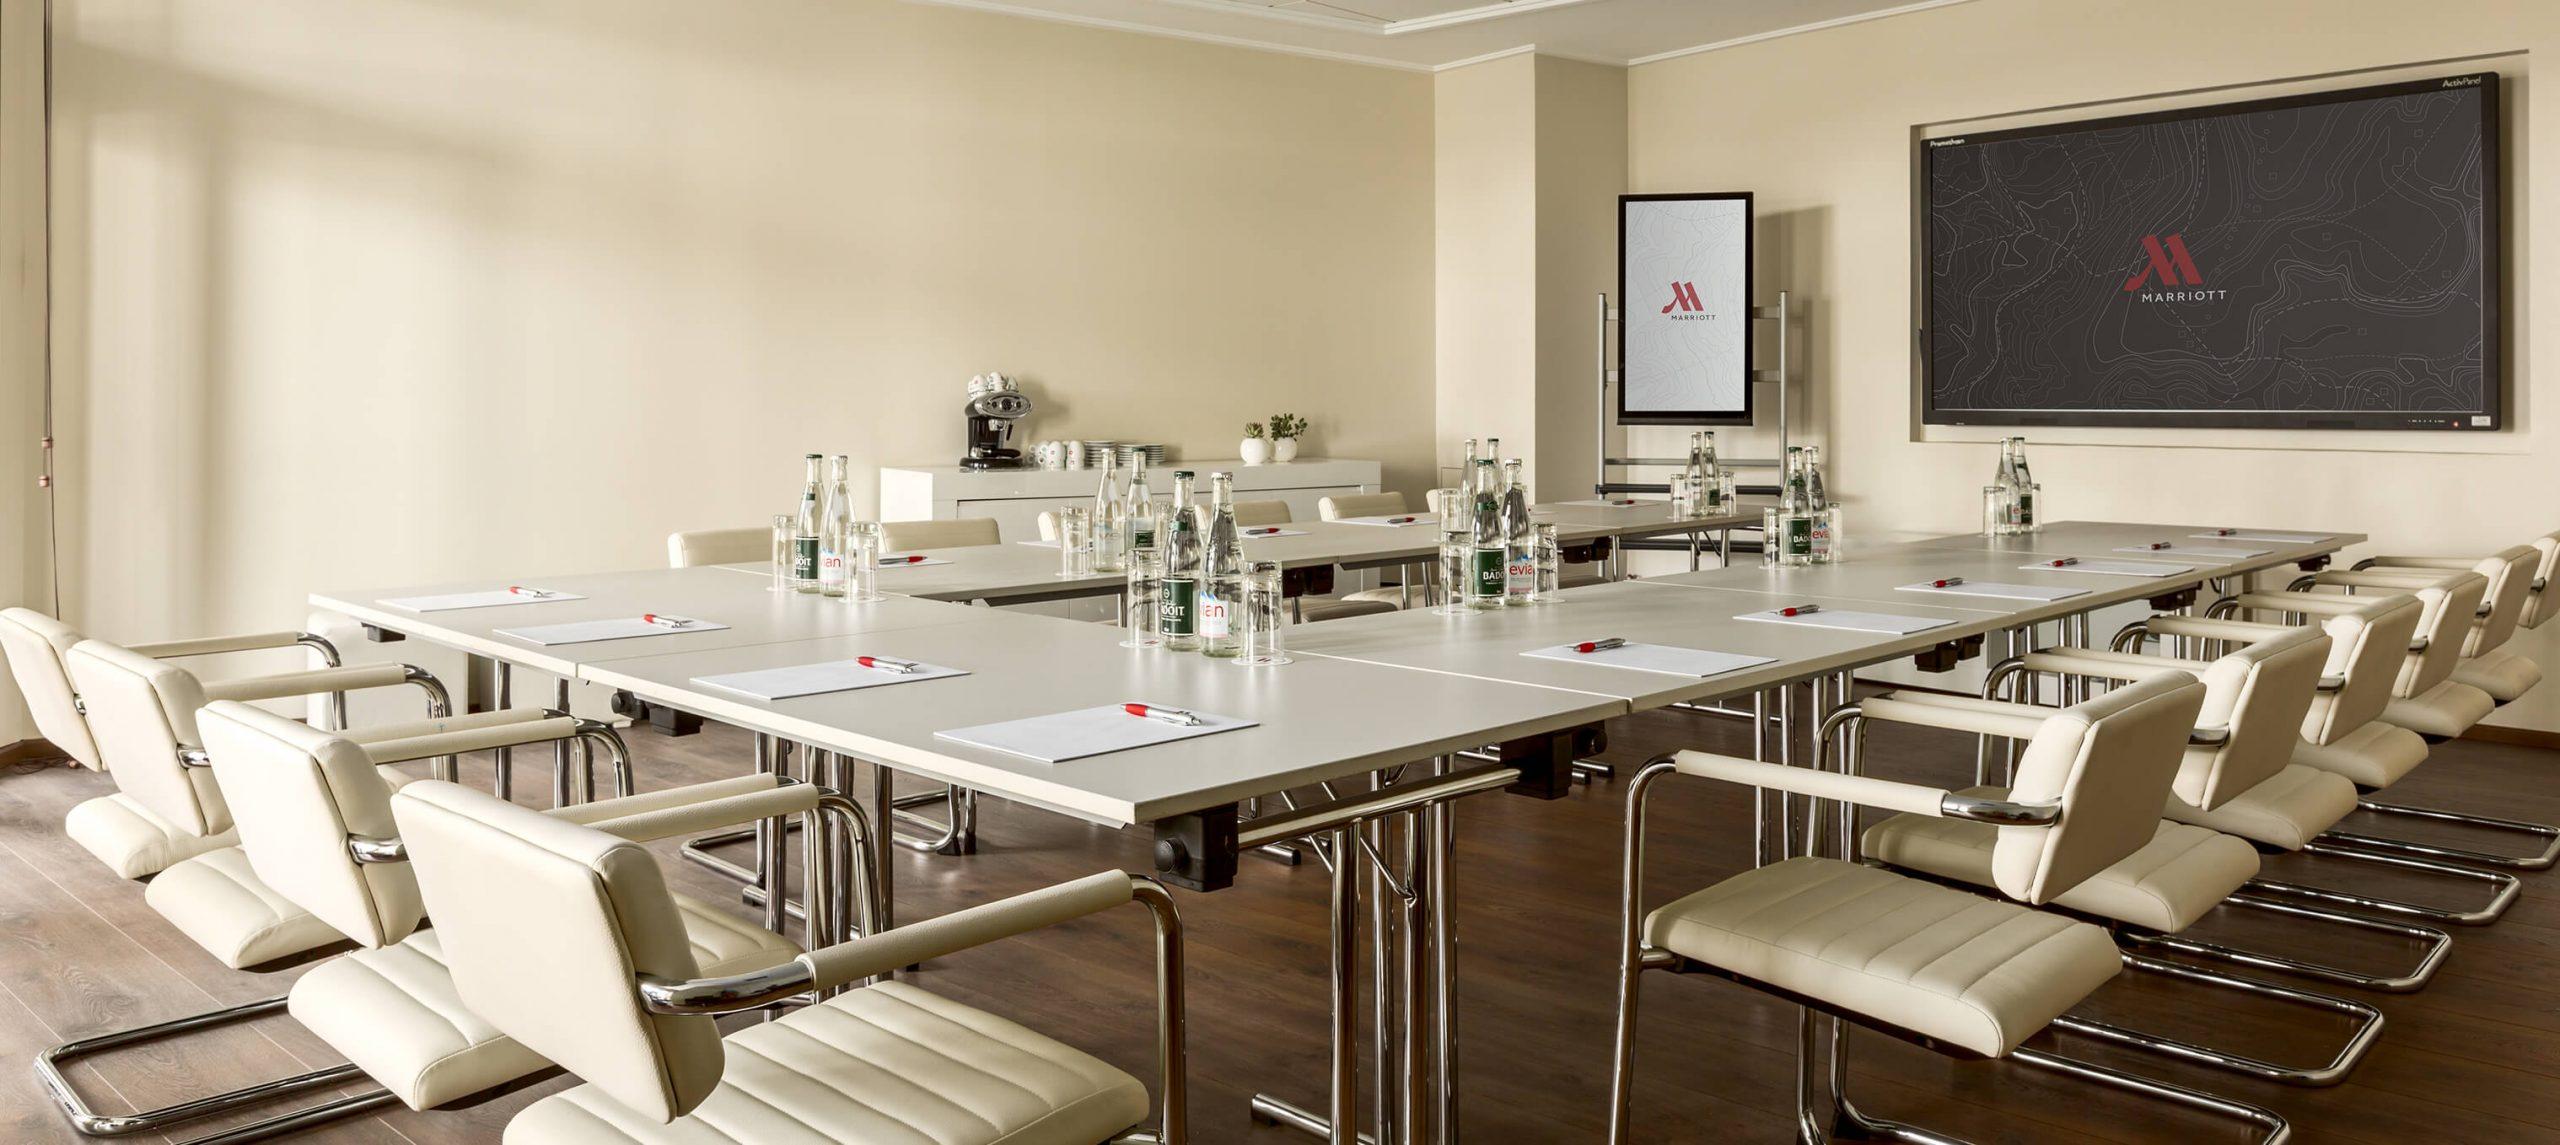 Tiani System C Marriott Hotel La Porte de Monaco conference room high tech 3036x1358